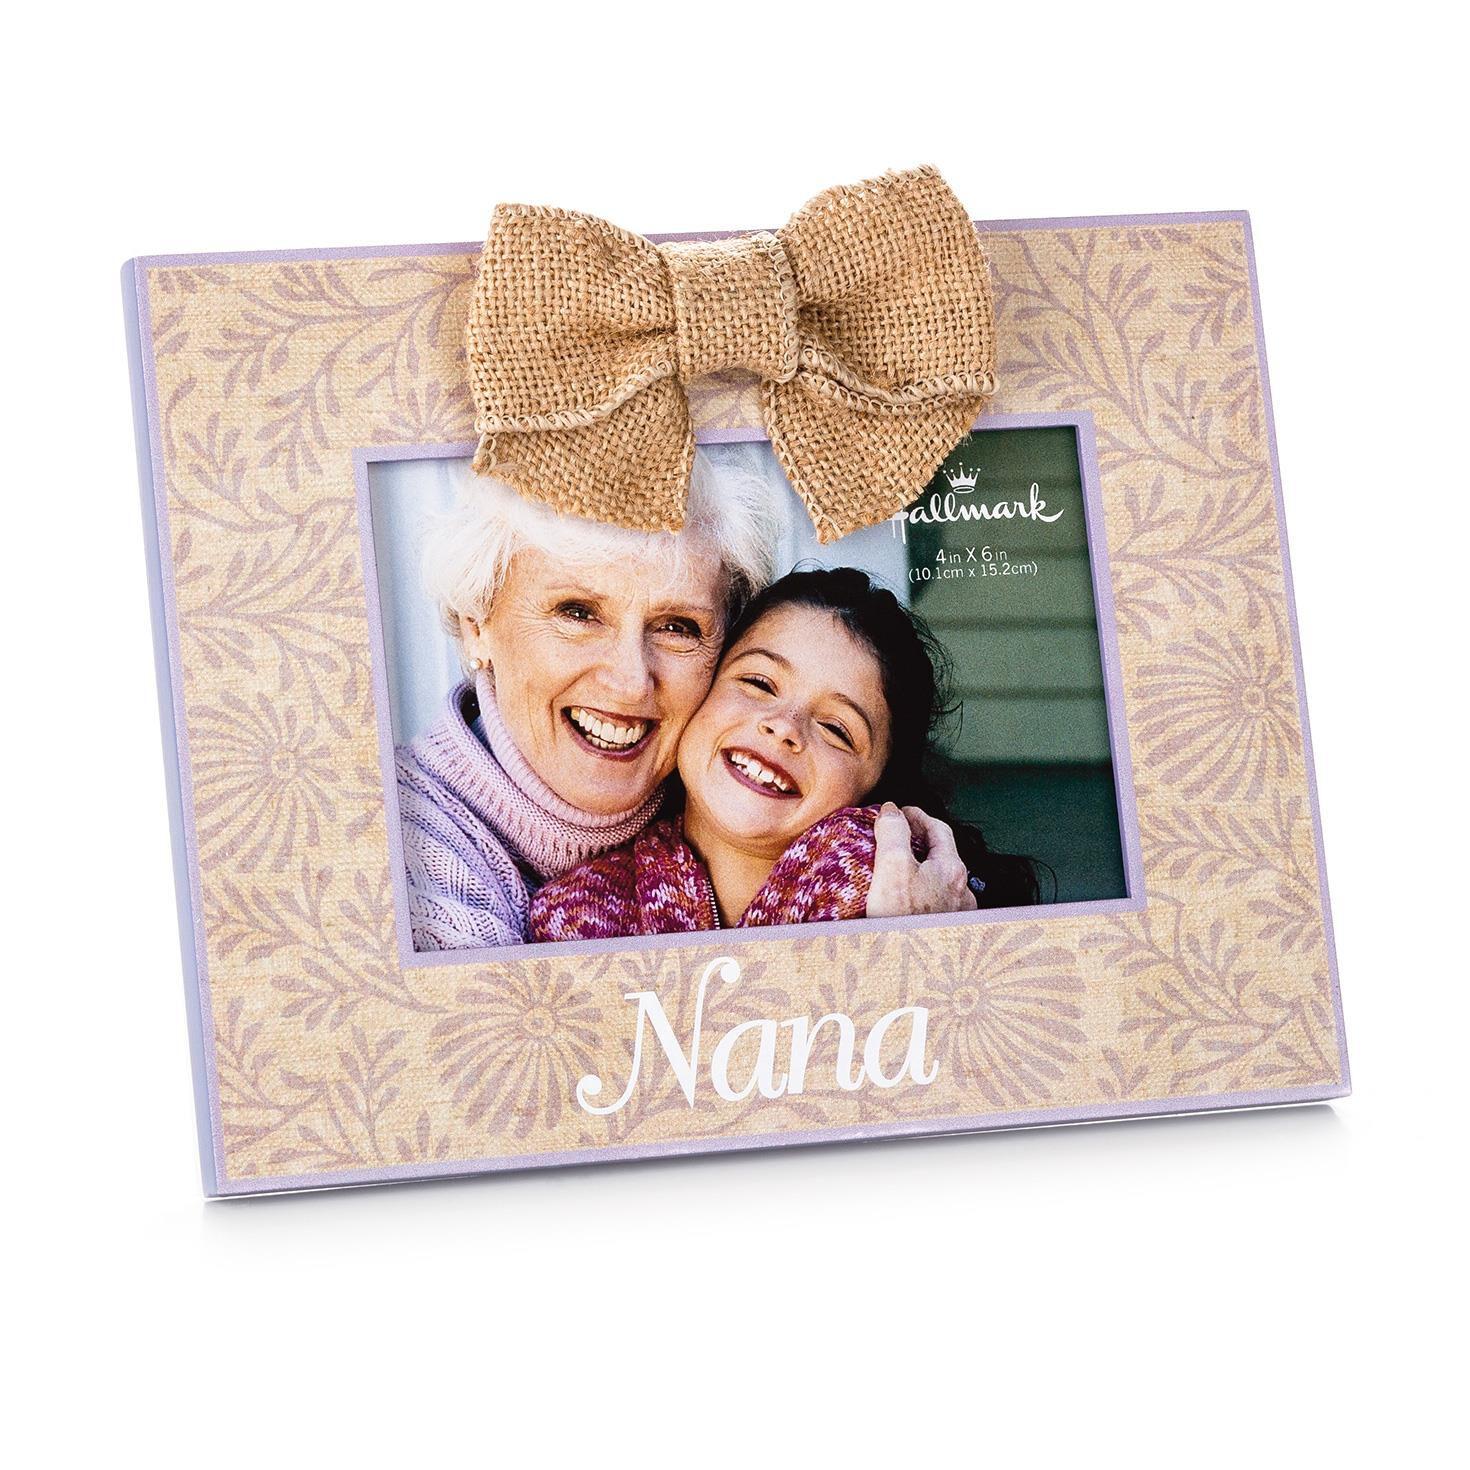 nana wood malden picture frame 4x6 picture frames hallmark